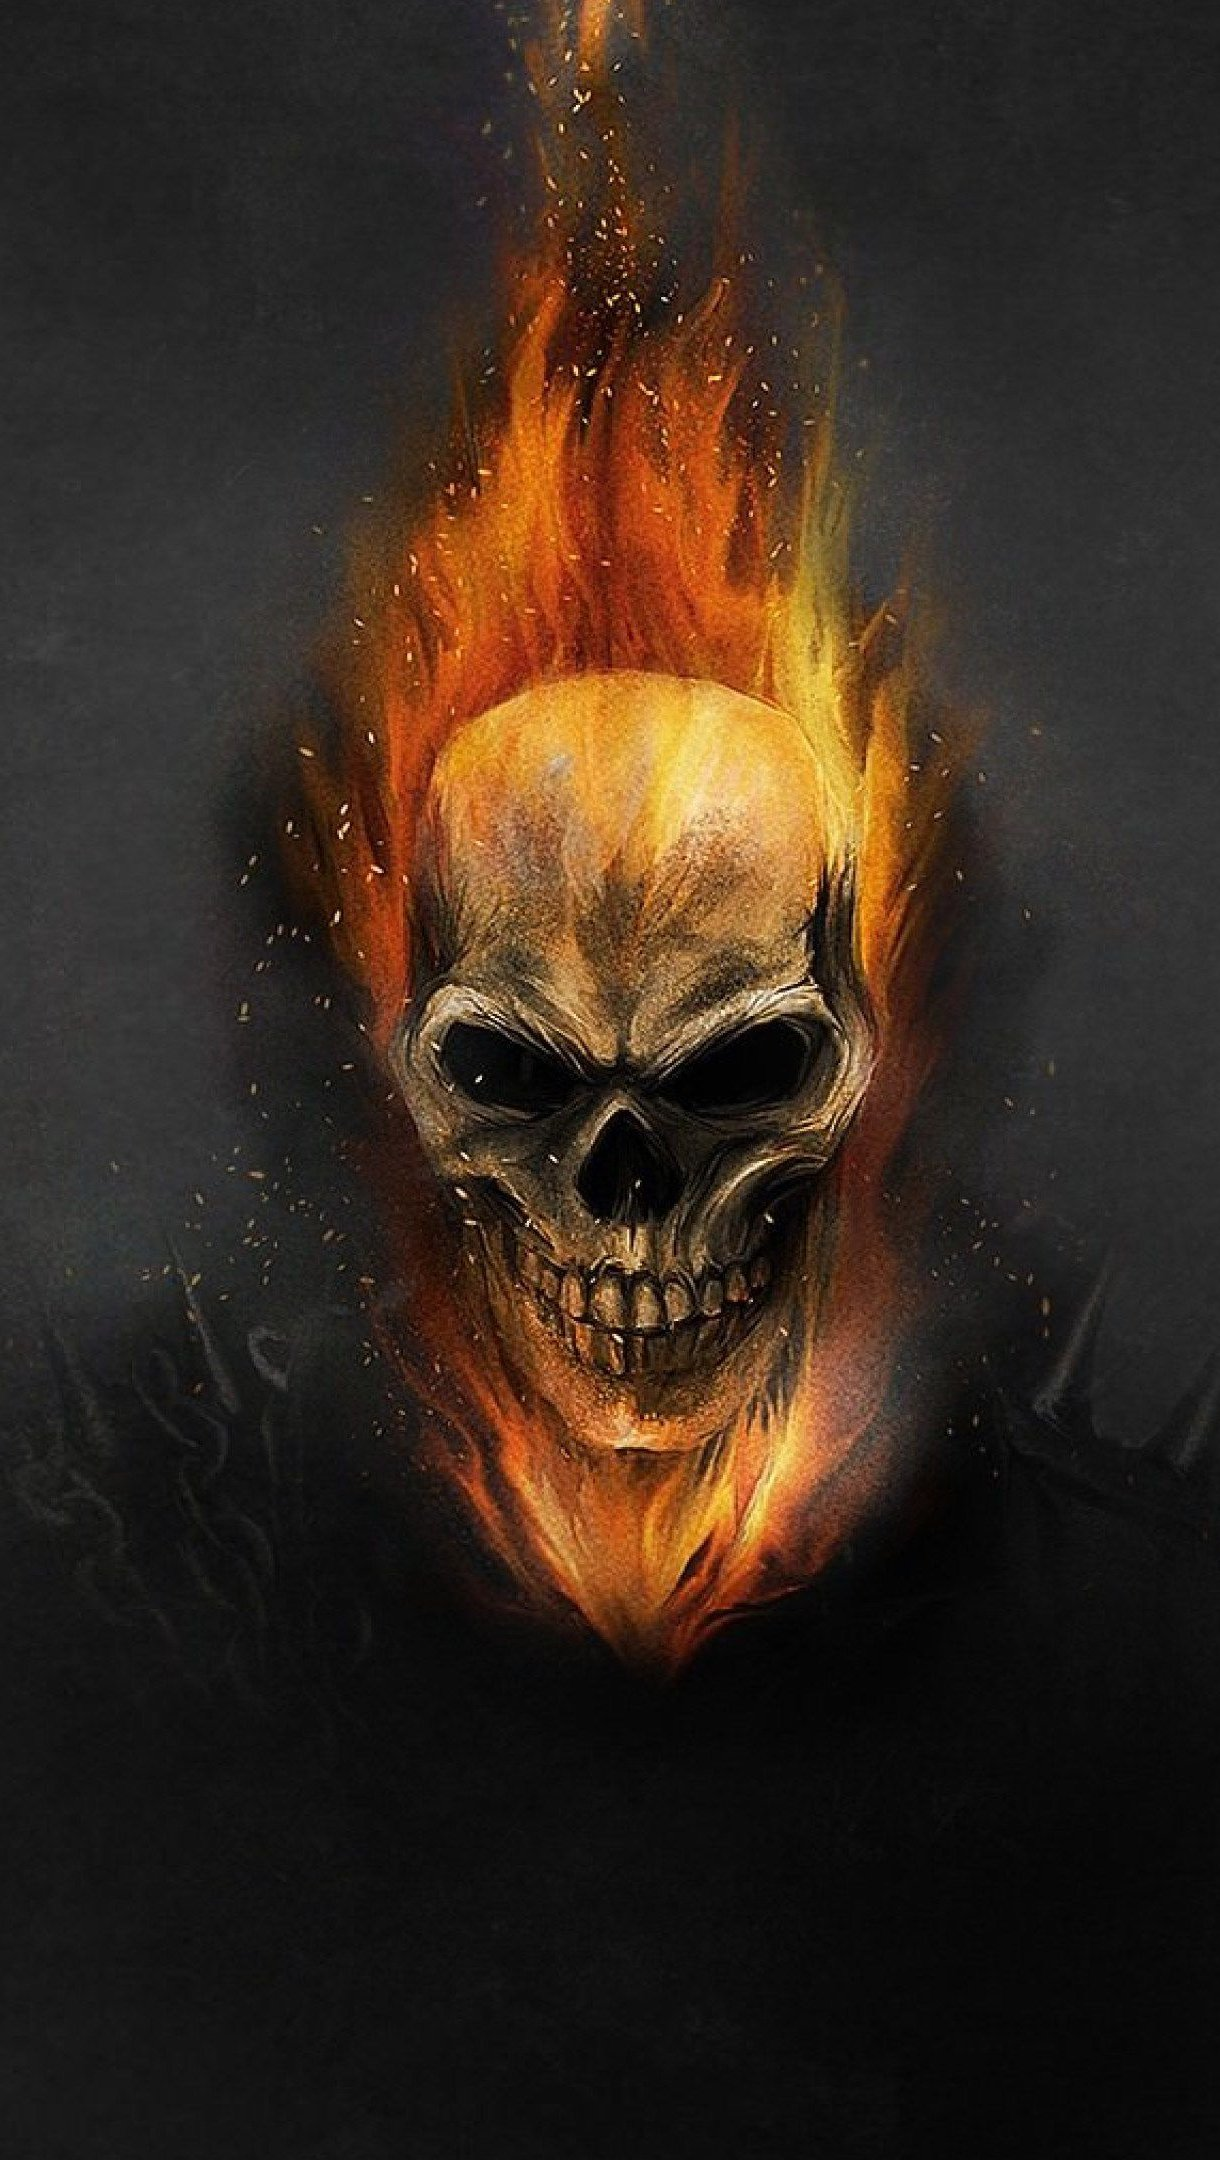 Fondos de pantalla Ghost Rider Fanart Vertical